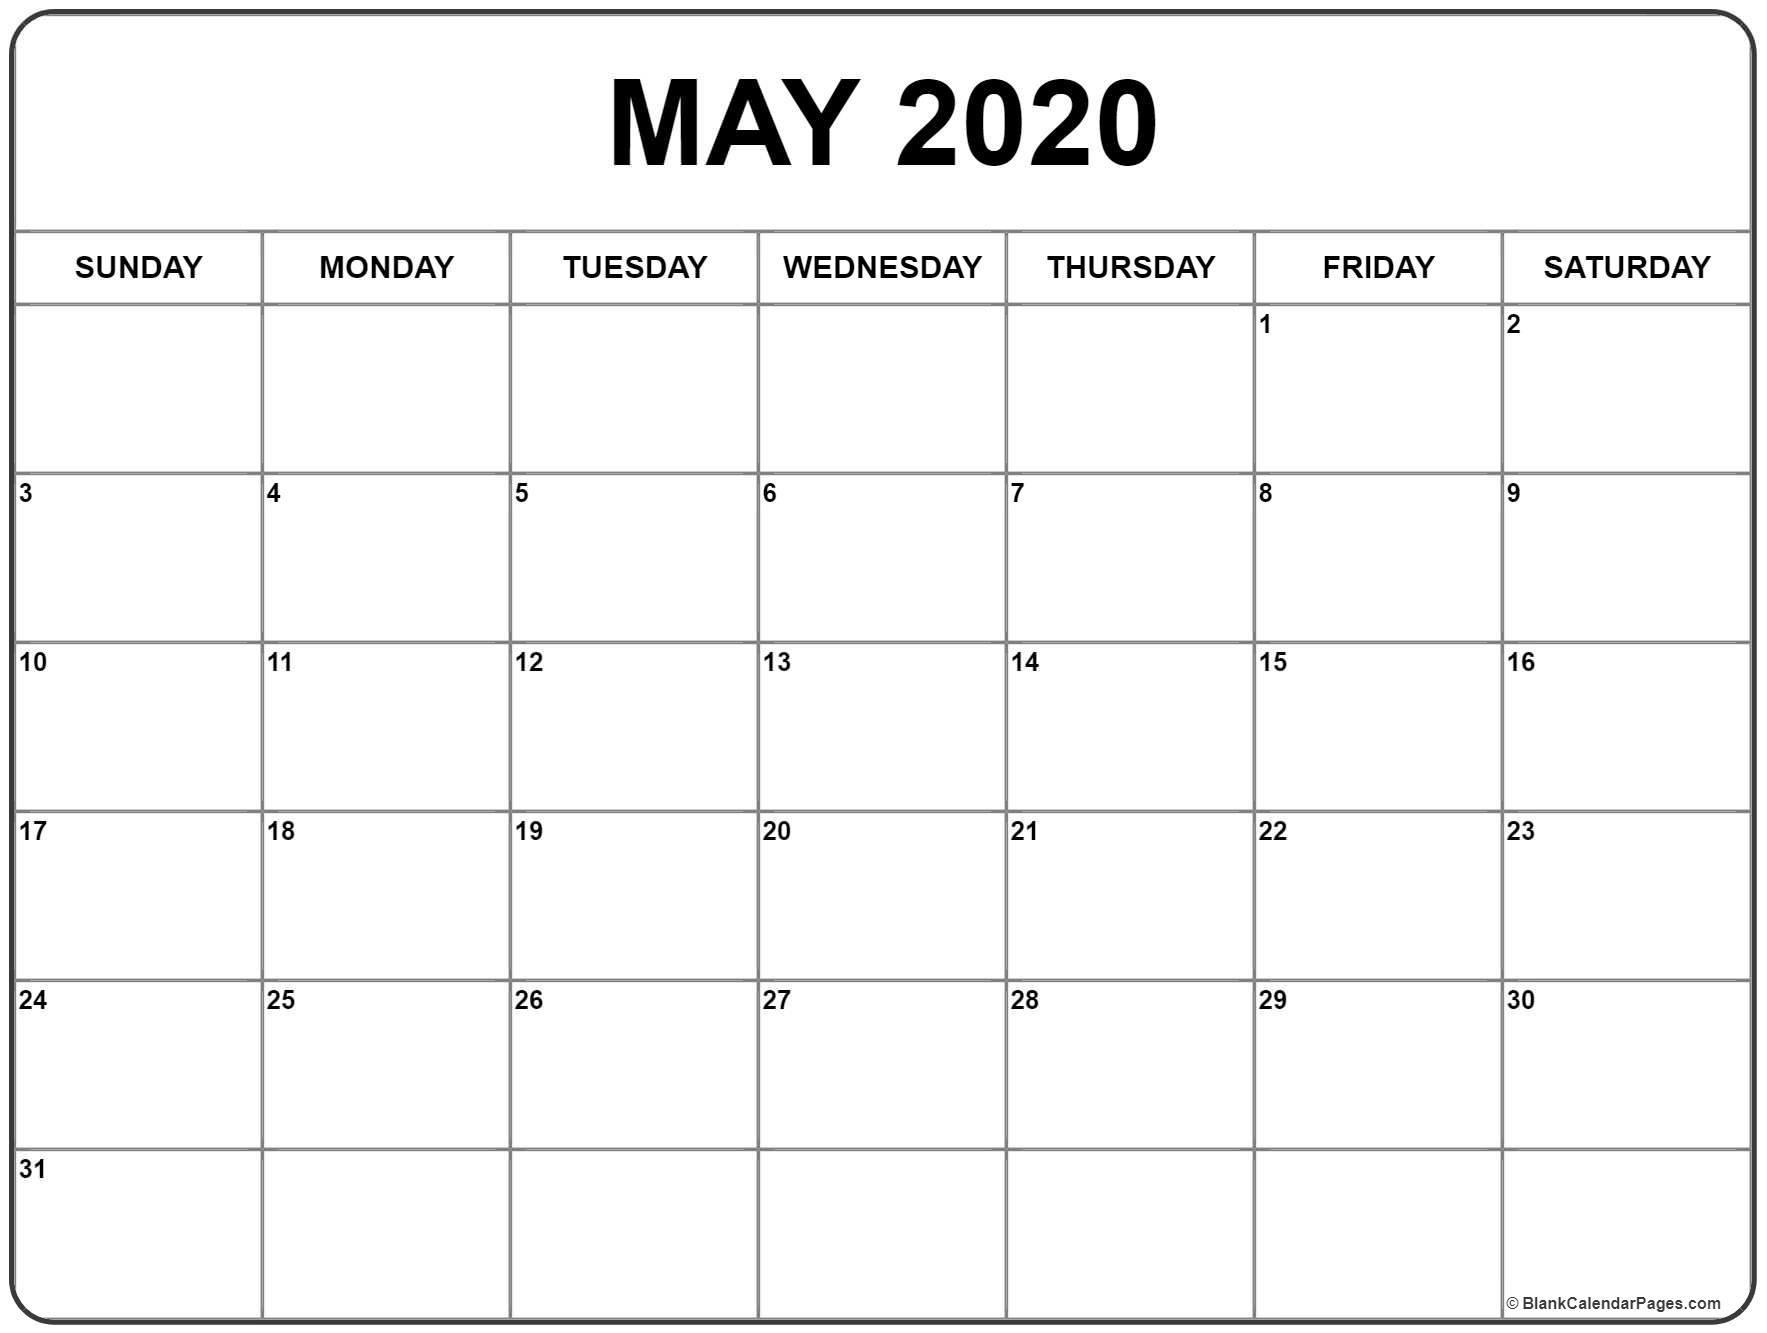 May 2020 Calendar | Free Printable Monthly Calendars-2020 Calendar Templates Monday - Friday